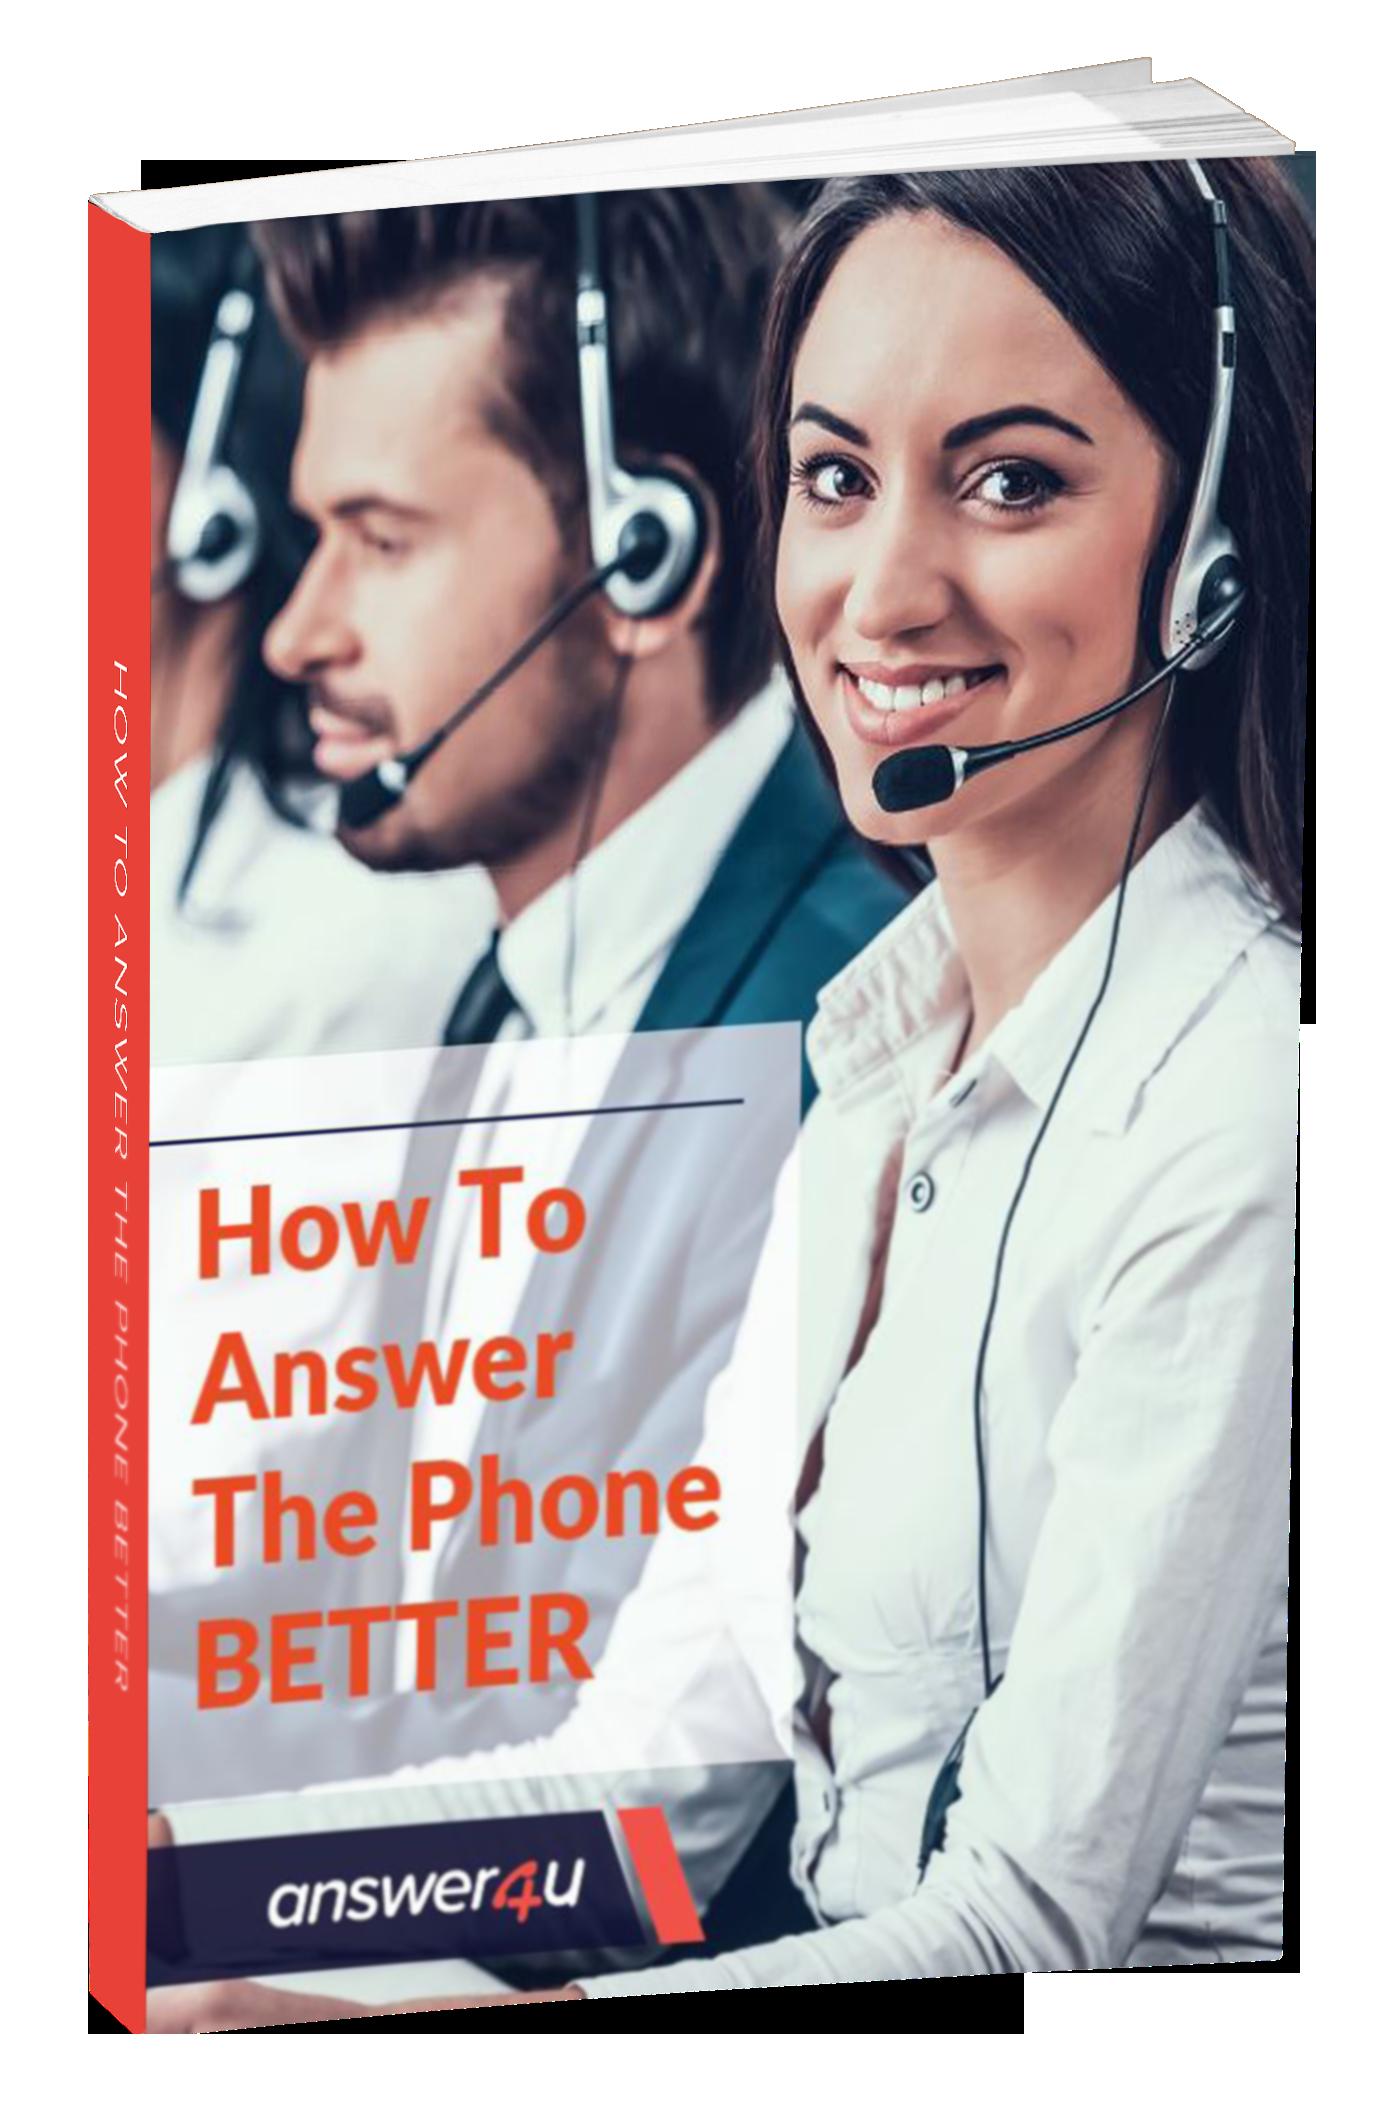 answer-4-u-answerthephonebetterguide-mock-up